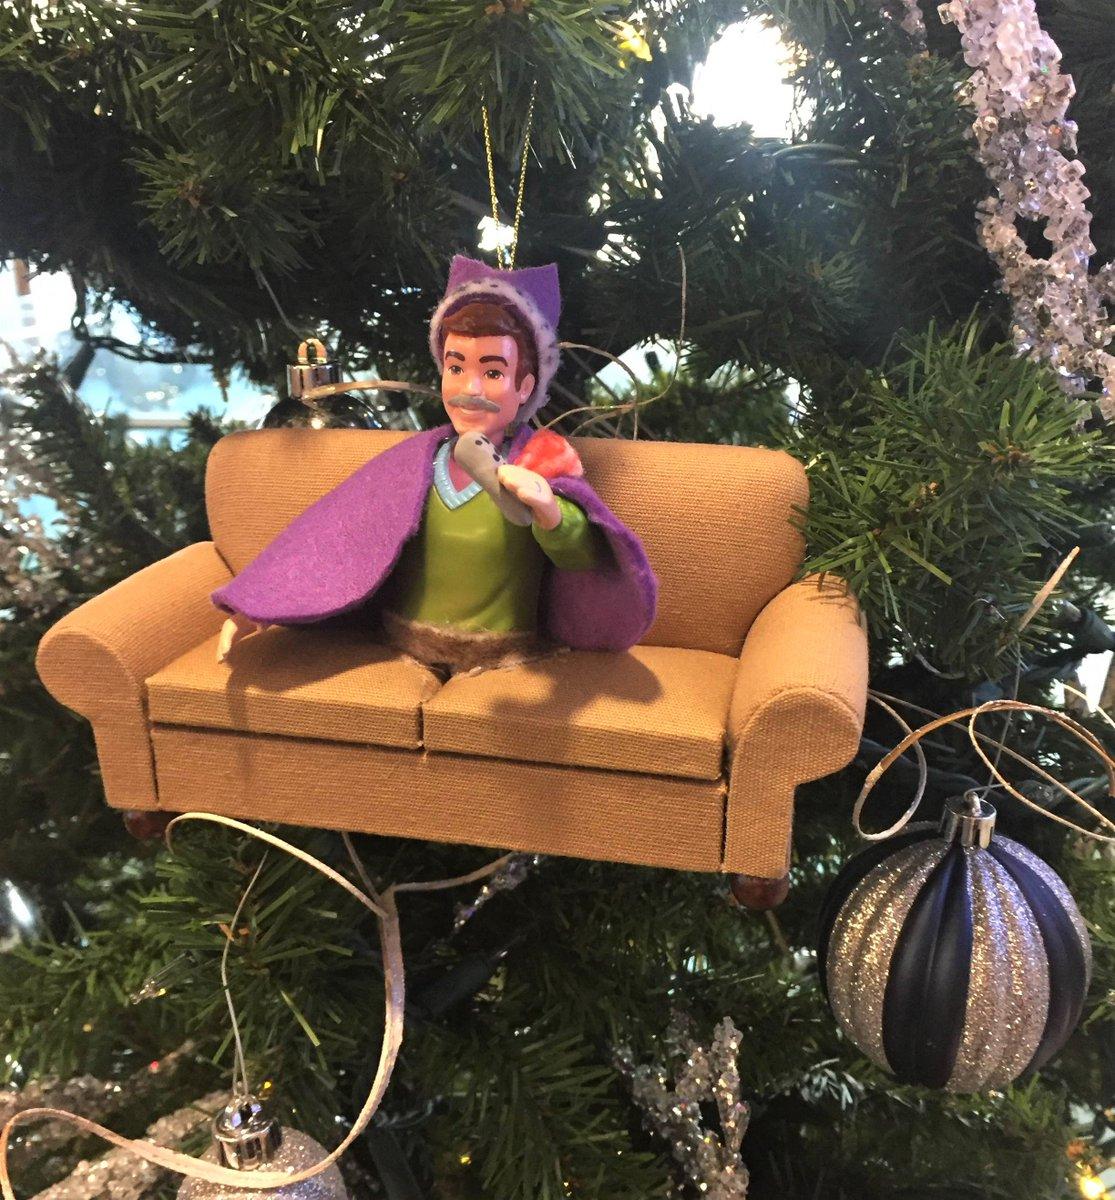 Studio C Christmas.Studio C On Twitter King Warrick Is Making A Guest